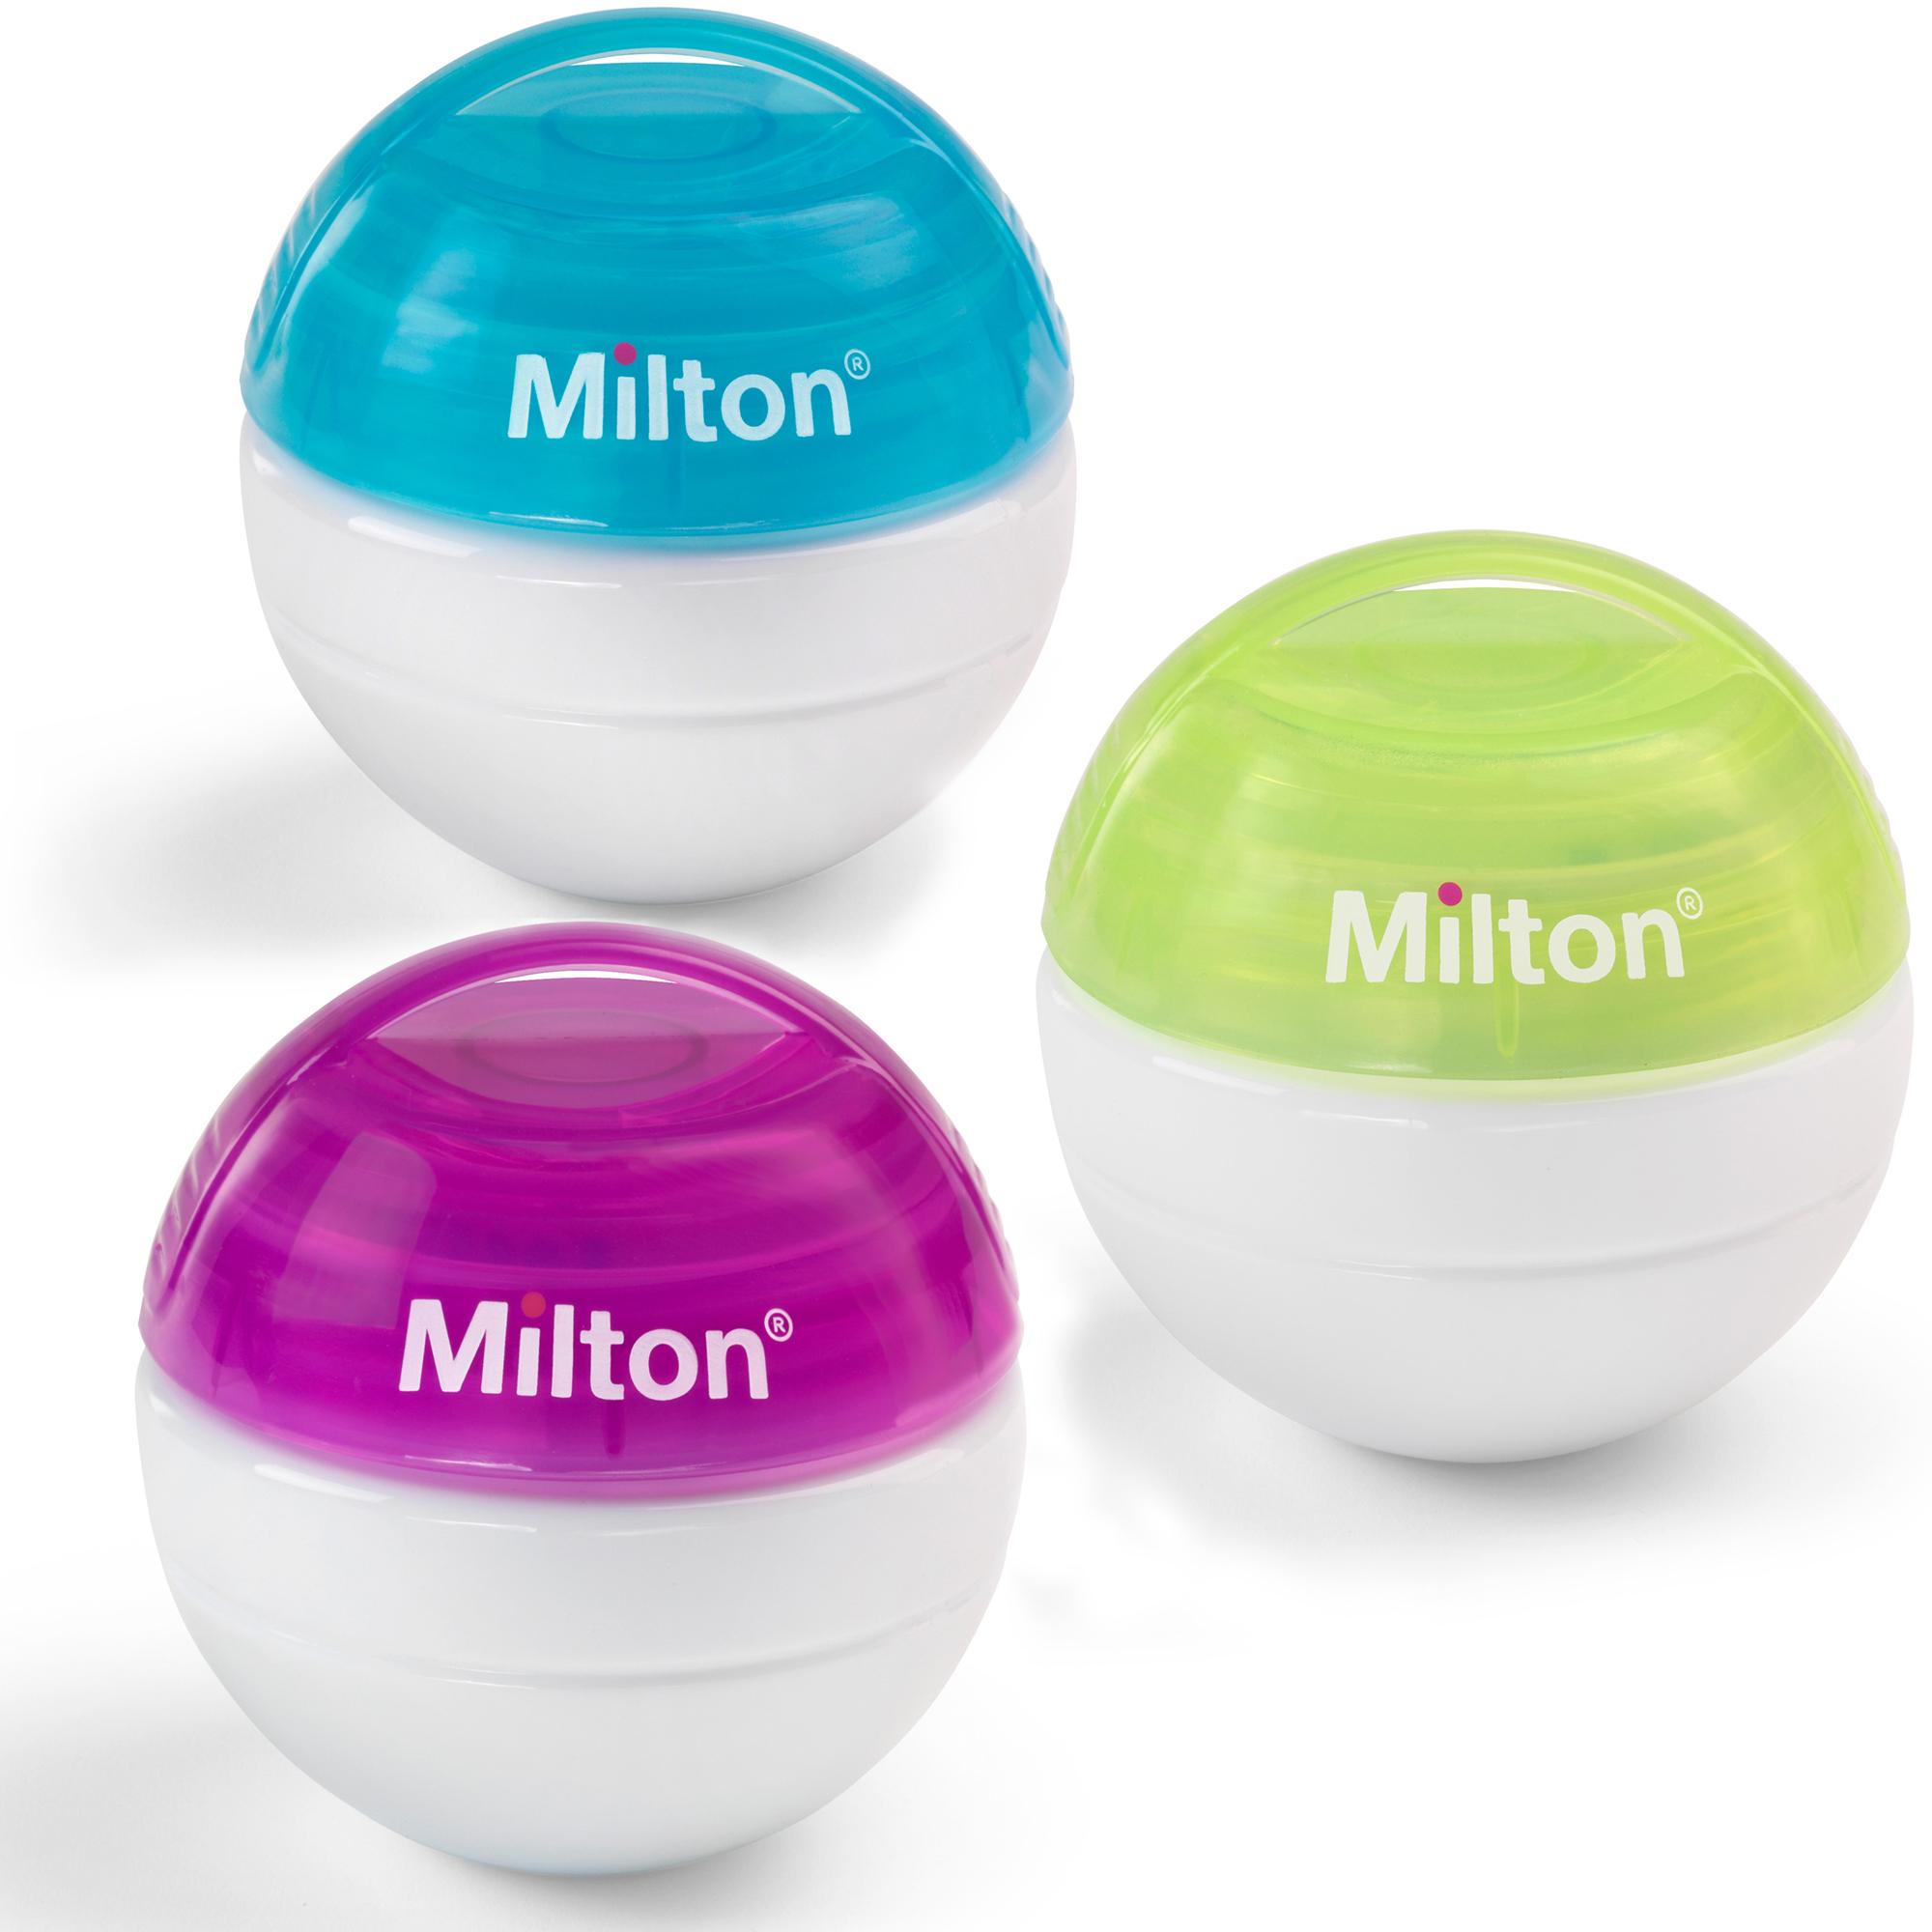 milton mini sterilising tablets instructions